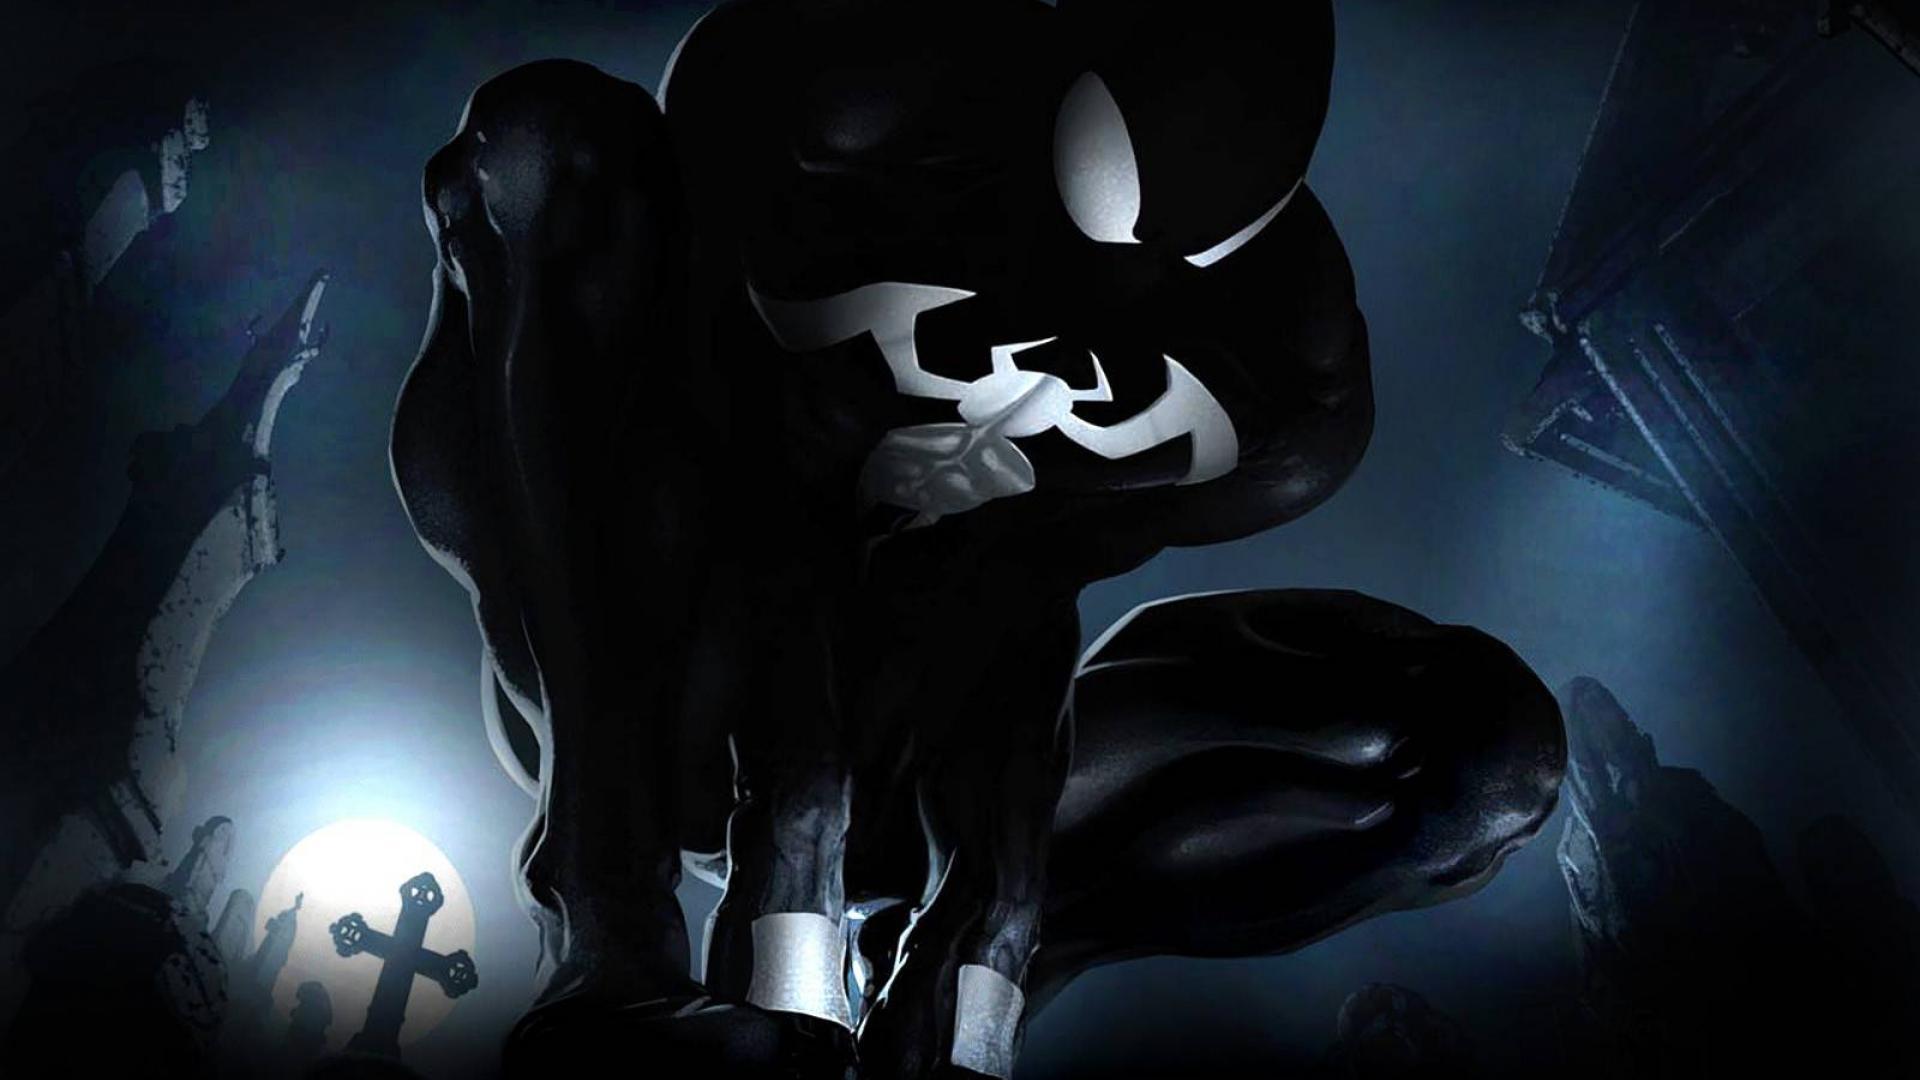 3d comic shadows of the past episode 3 - 41 part 6